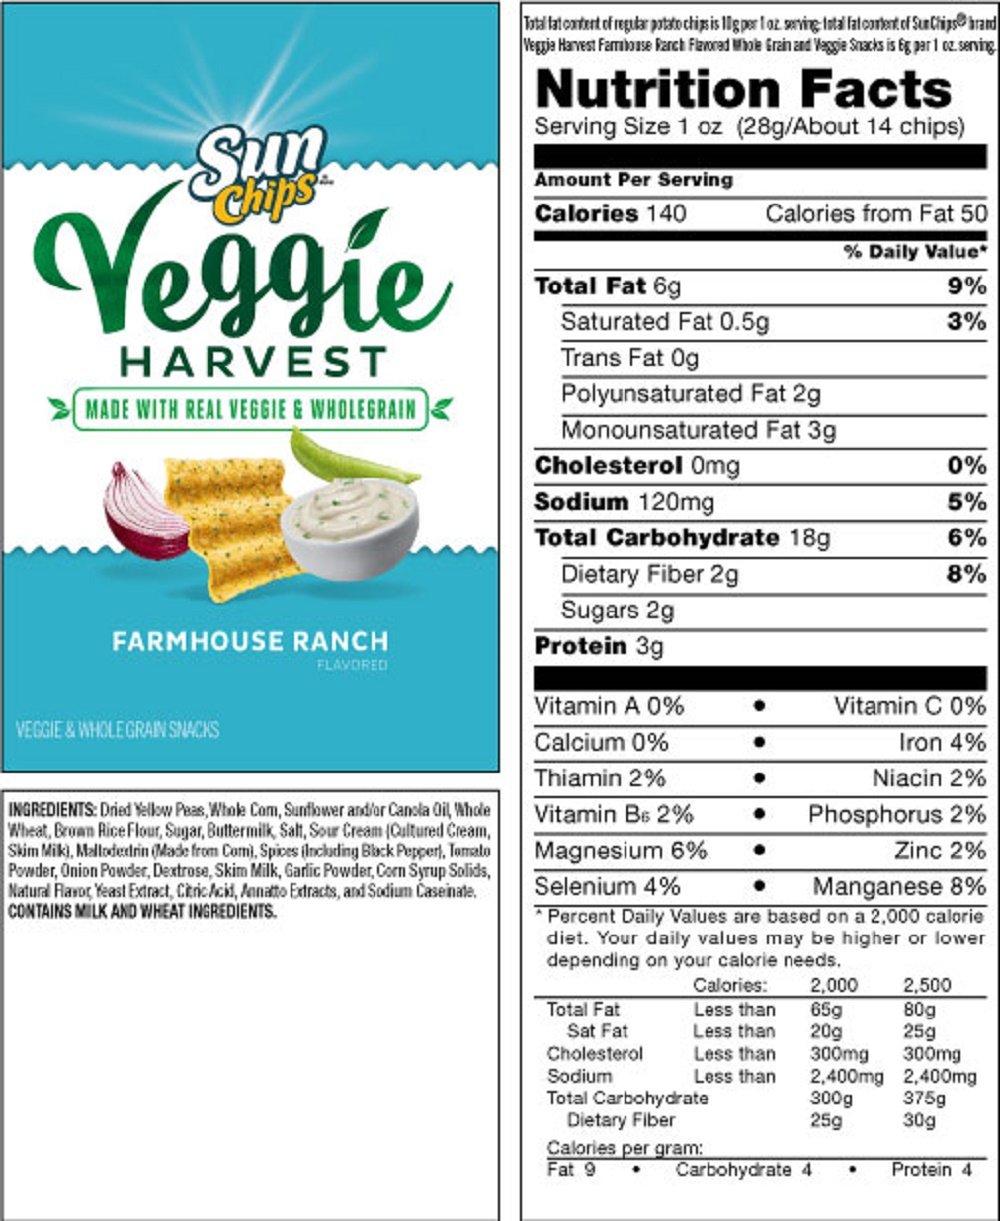 Amazoncom Frito Lay Sun Chips Veggie Harvest Chips 7oz Bag